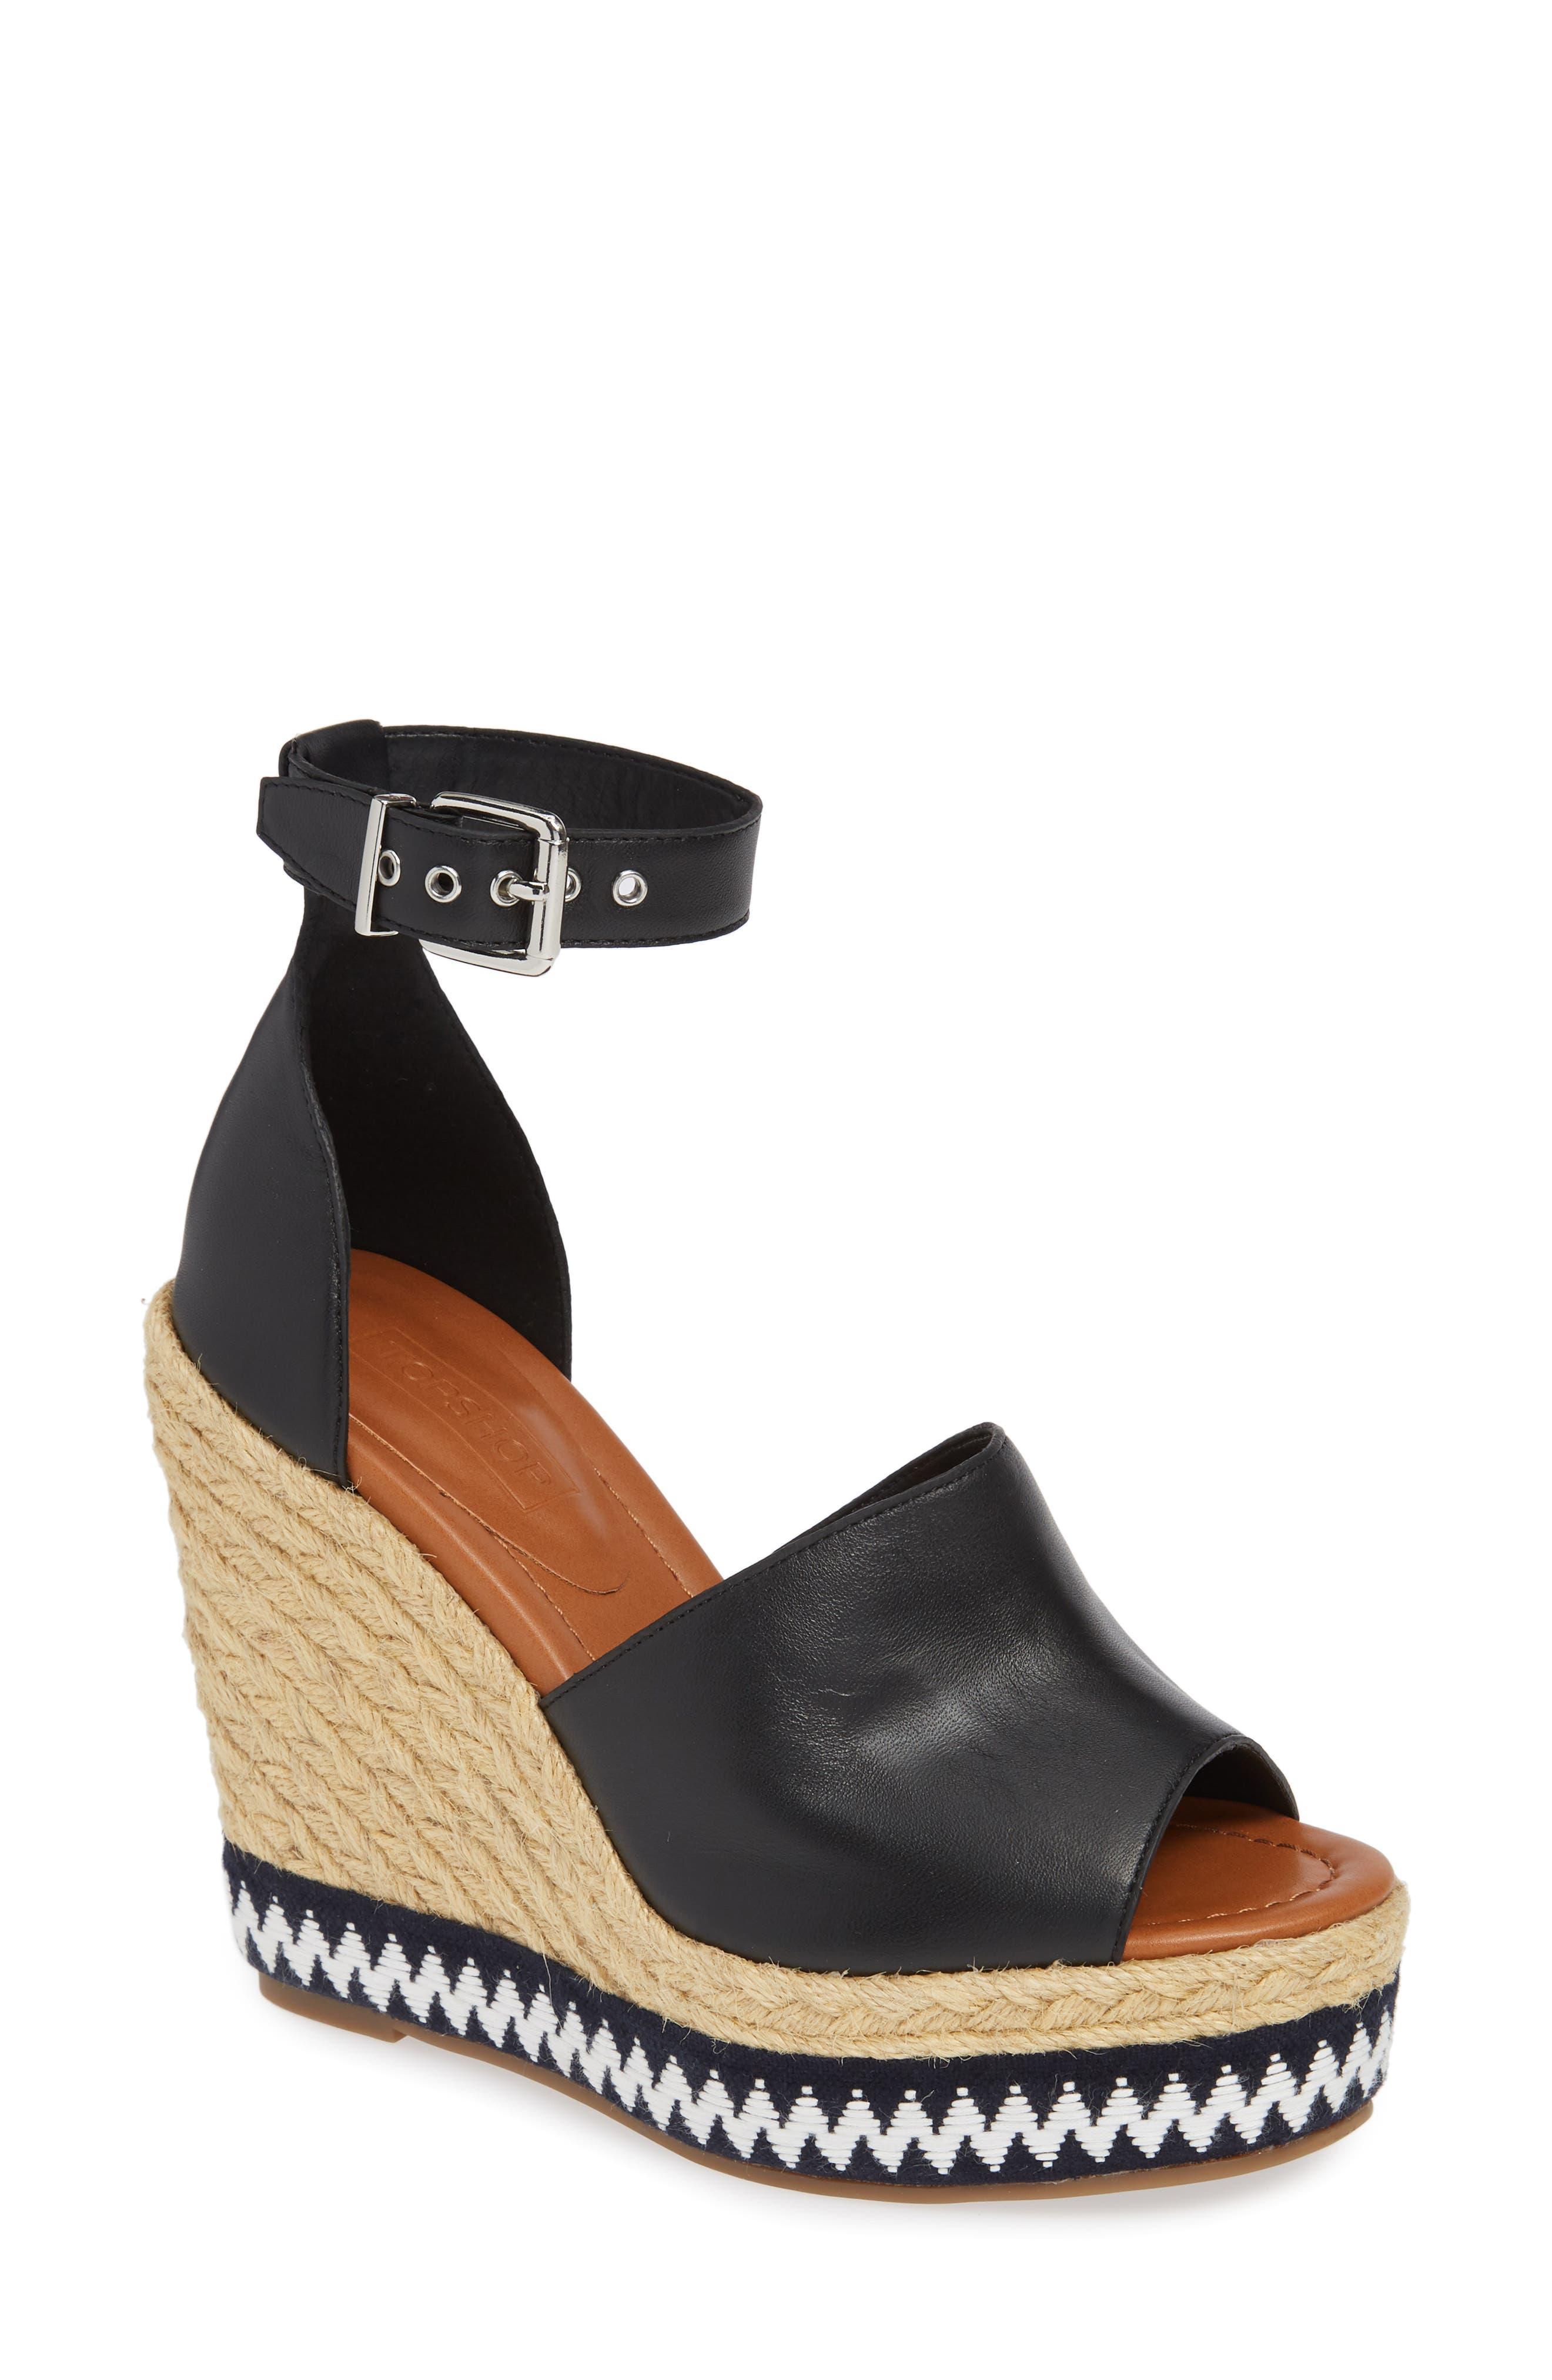 Wing Espadrille Wedge Sandal,                             Main thumbnail 1, color,                             Black